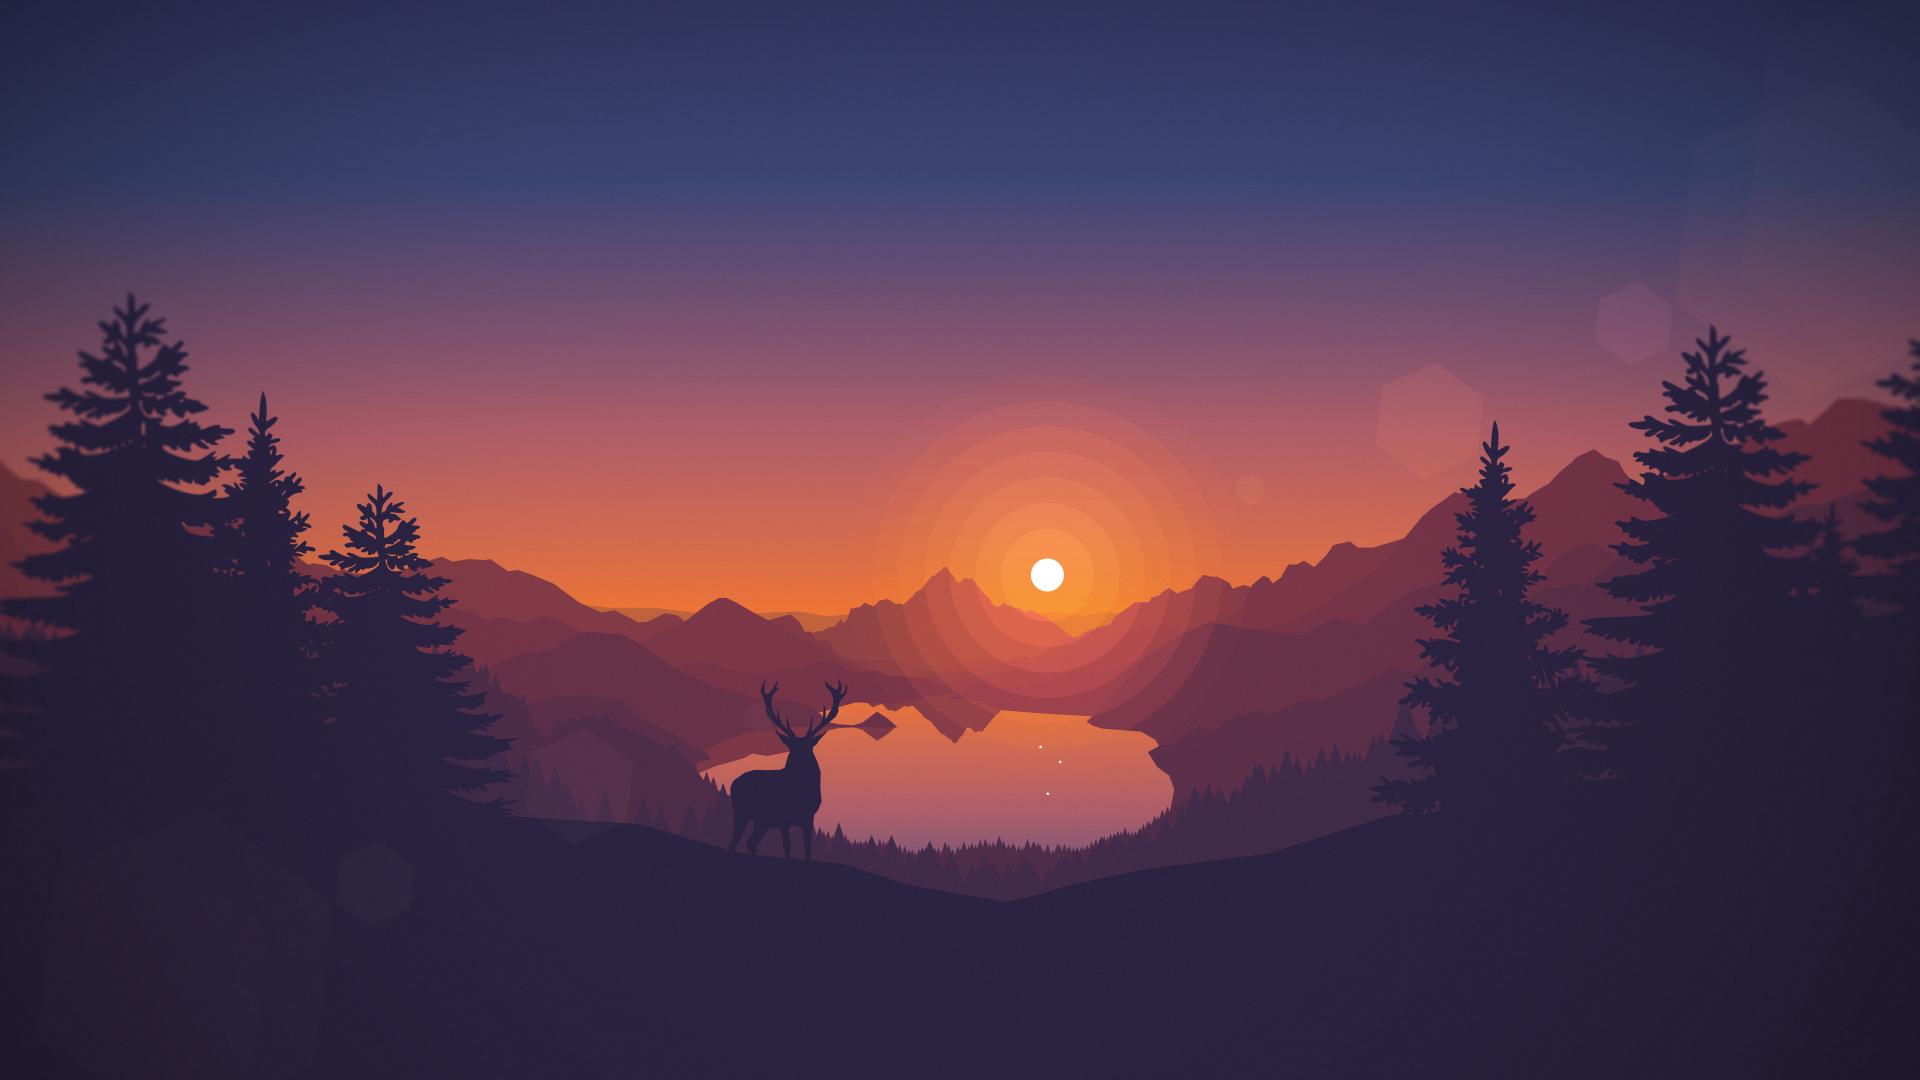 Lakeside_sunset_1920x1080